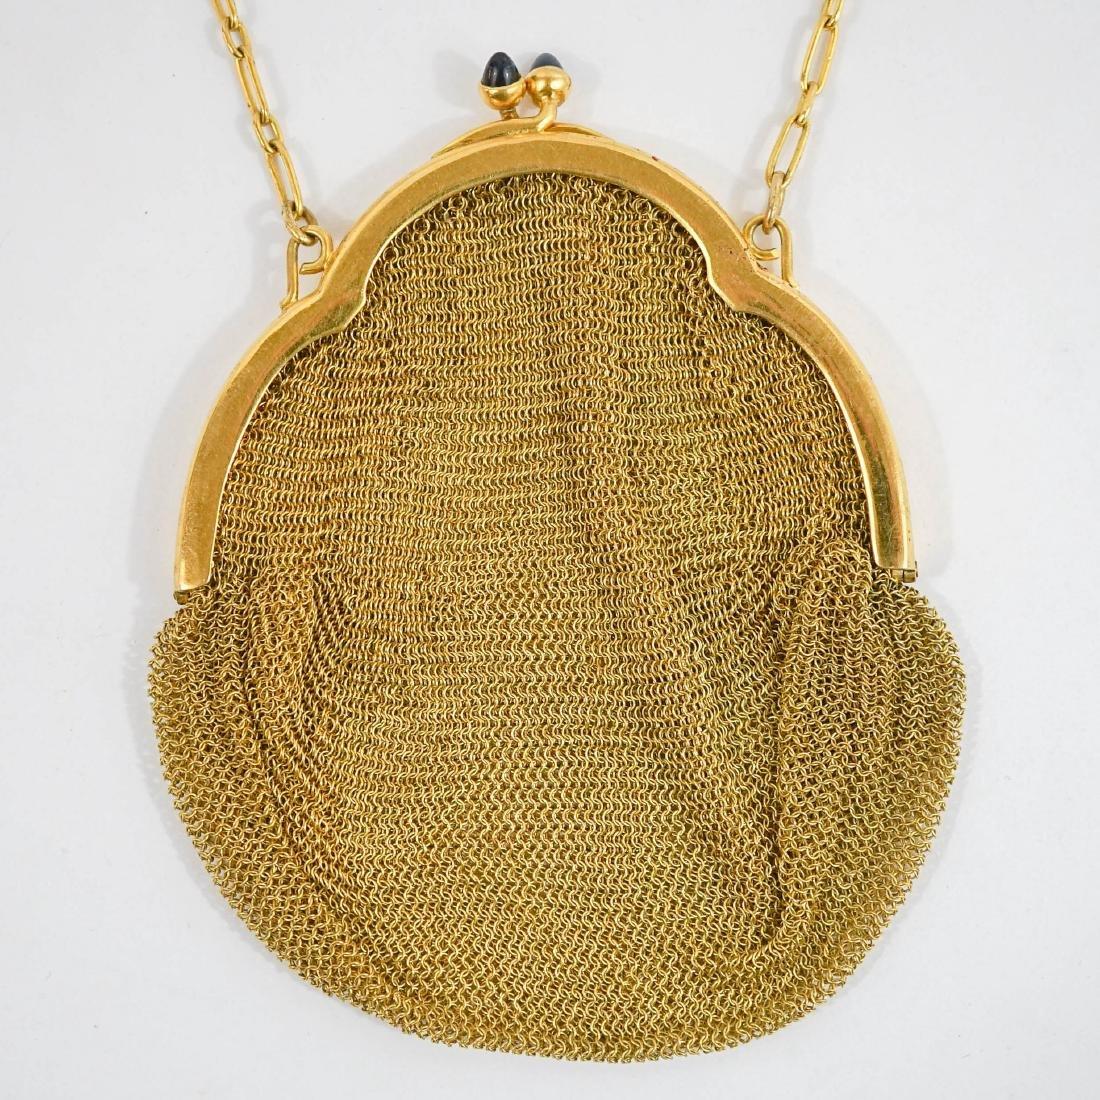 Gold Mesh Bag - 2